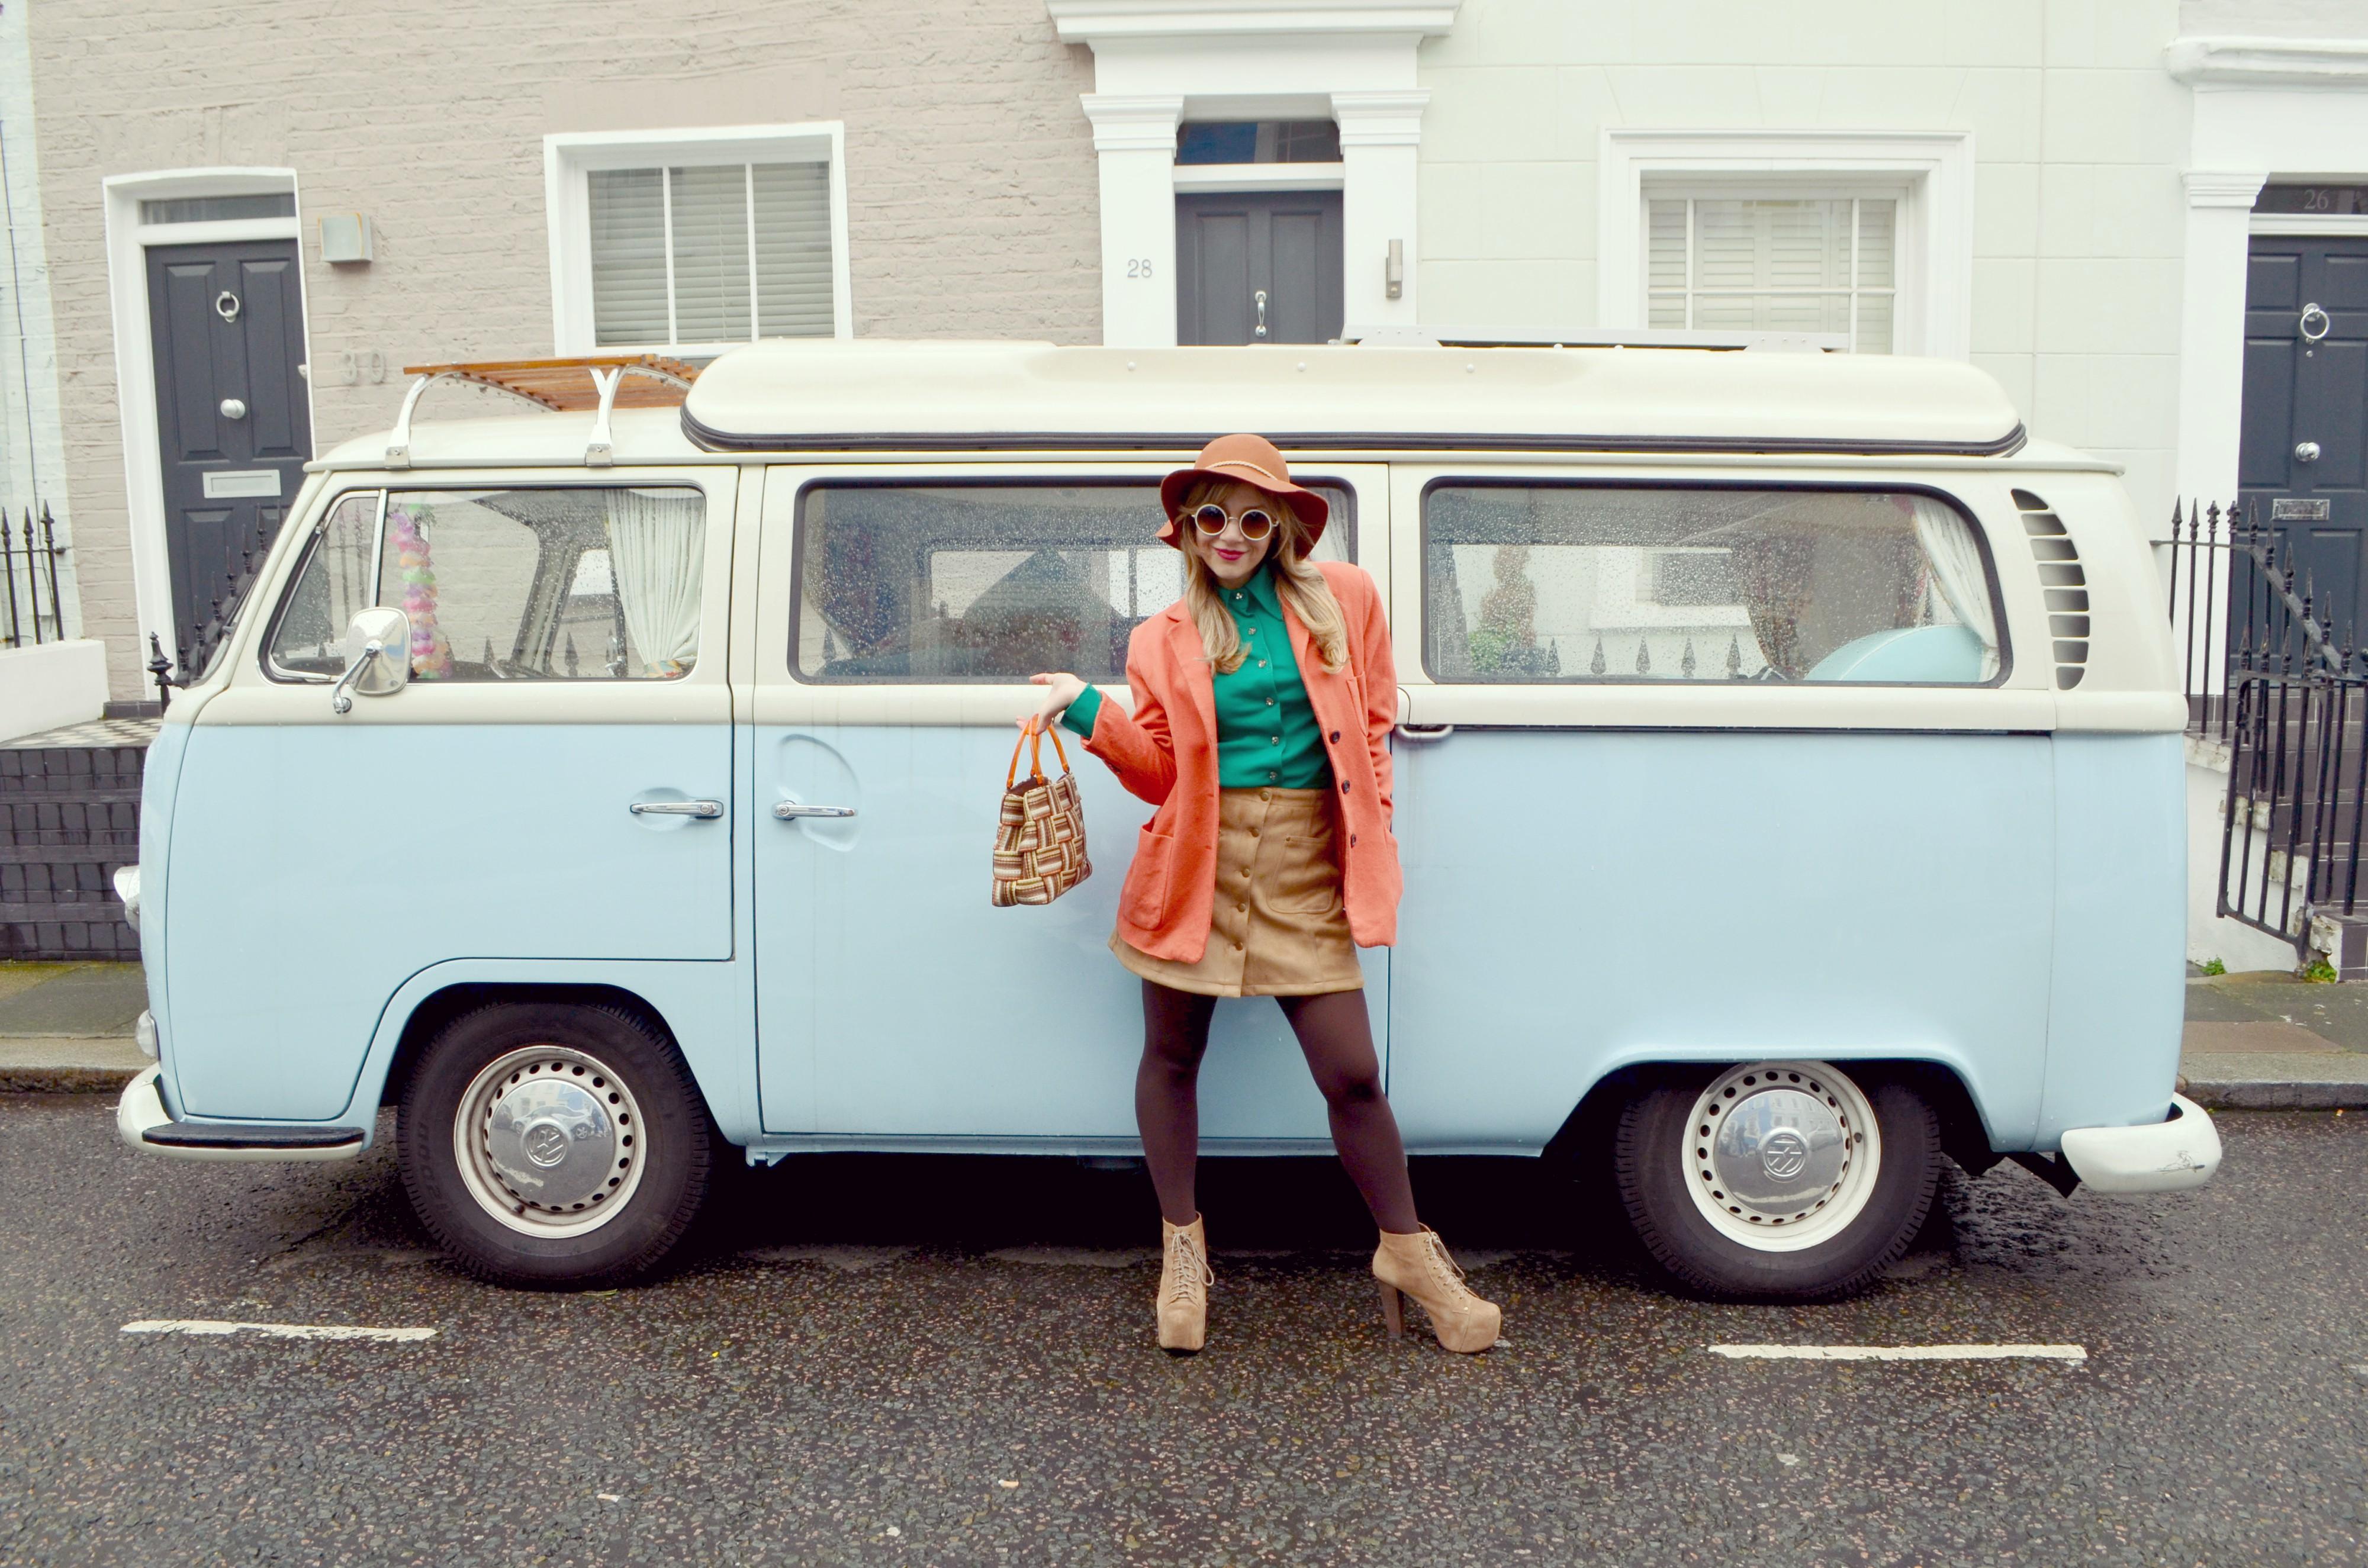 ChicAdicta-Chic-Adicta-blog-de-moda-vintage-london-street-style-ante-skirt-look-Notting-Hill-fashion-PiensaenChic-Piensa-en-Chic